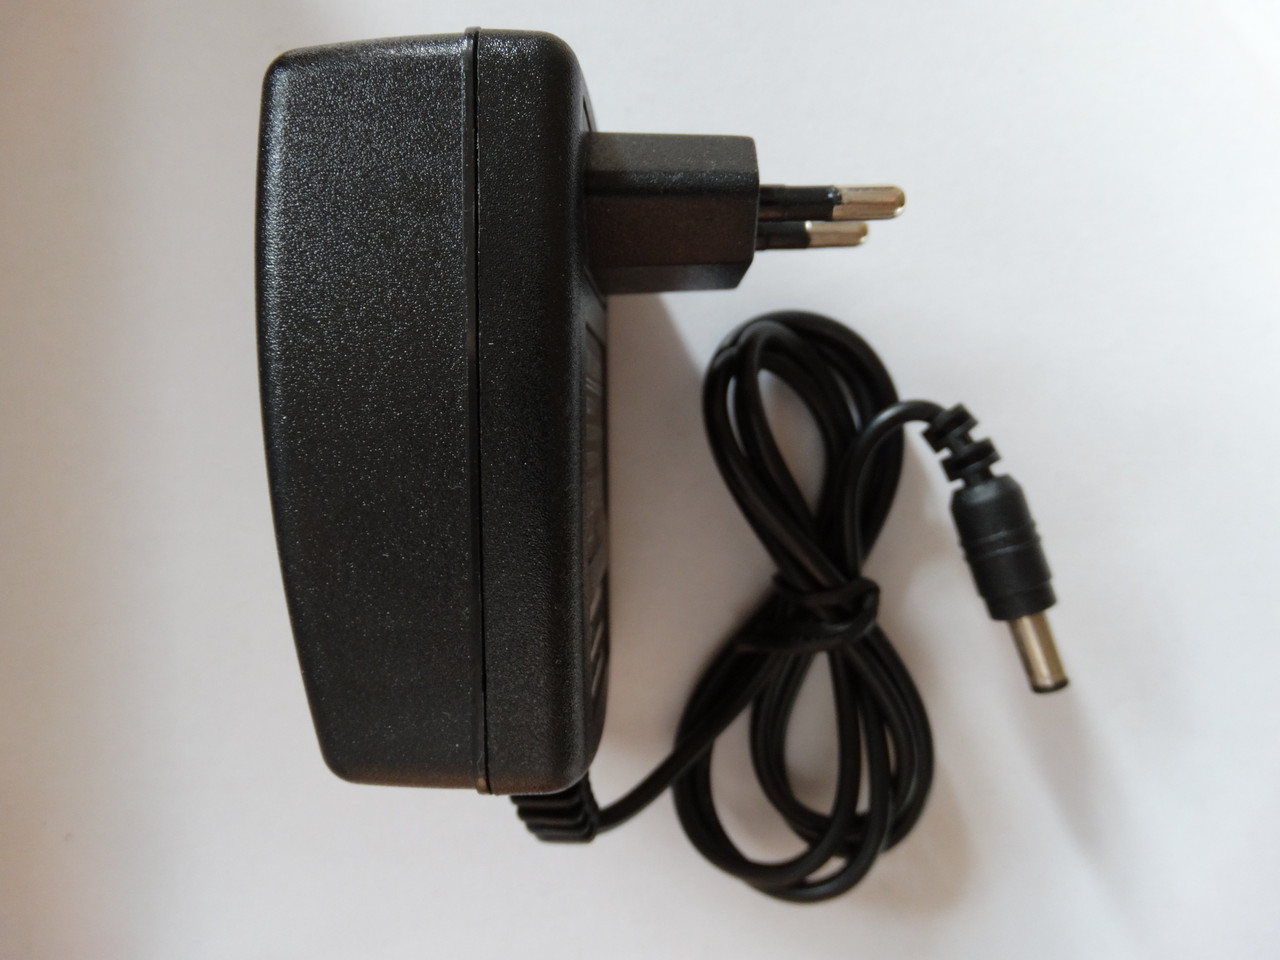 15v 2A Блок питания зарядка штекер 5,5х2,5 мм